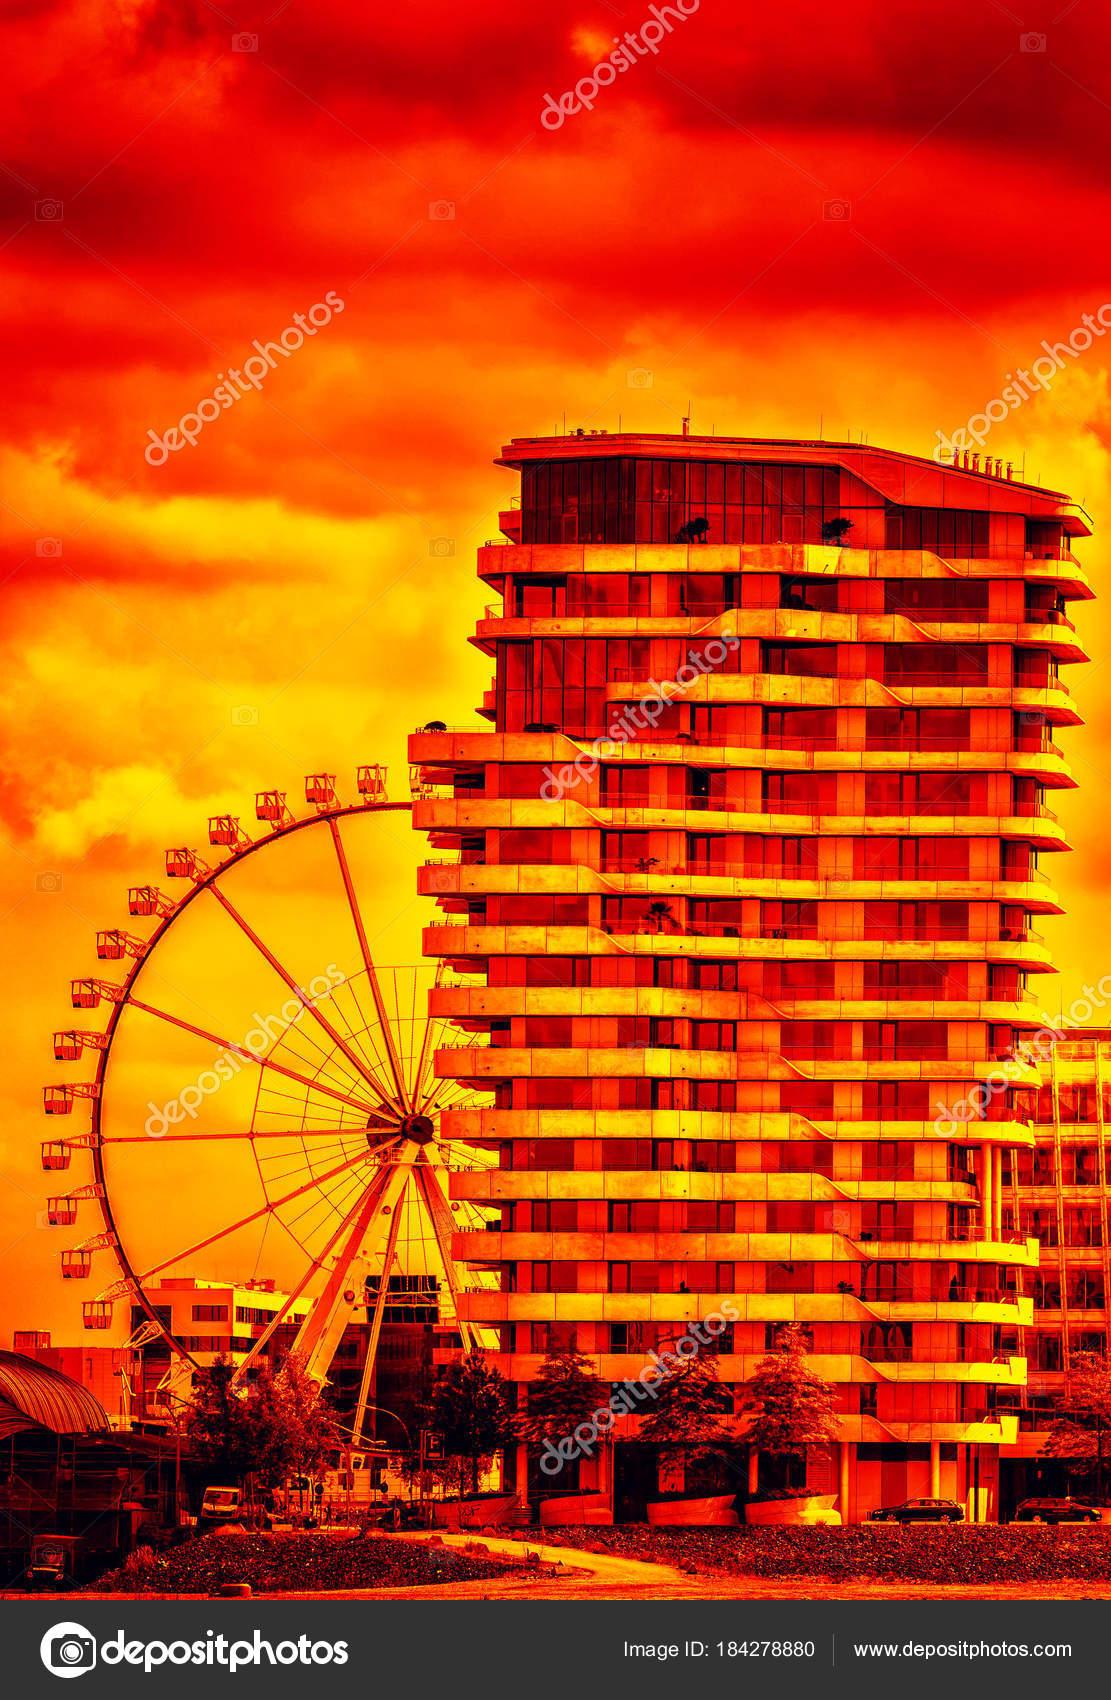 Marco Polo Tower Hamburg City — Stock Photo © CHROMORANGE #184278880